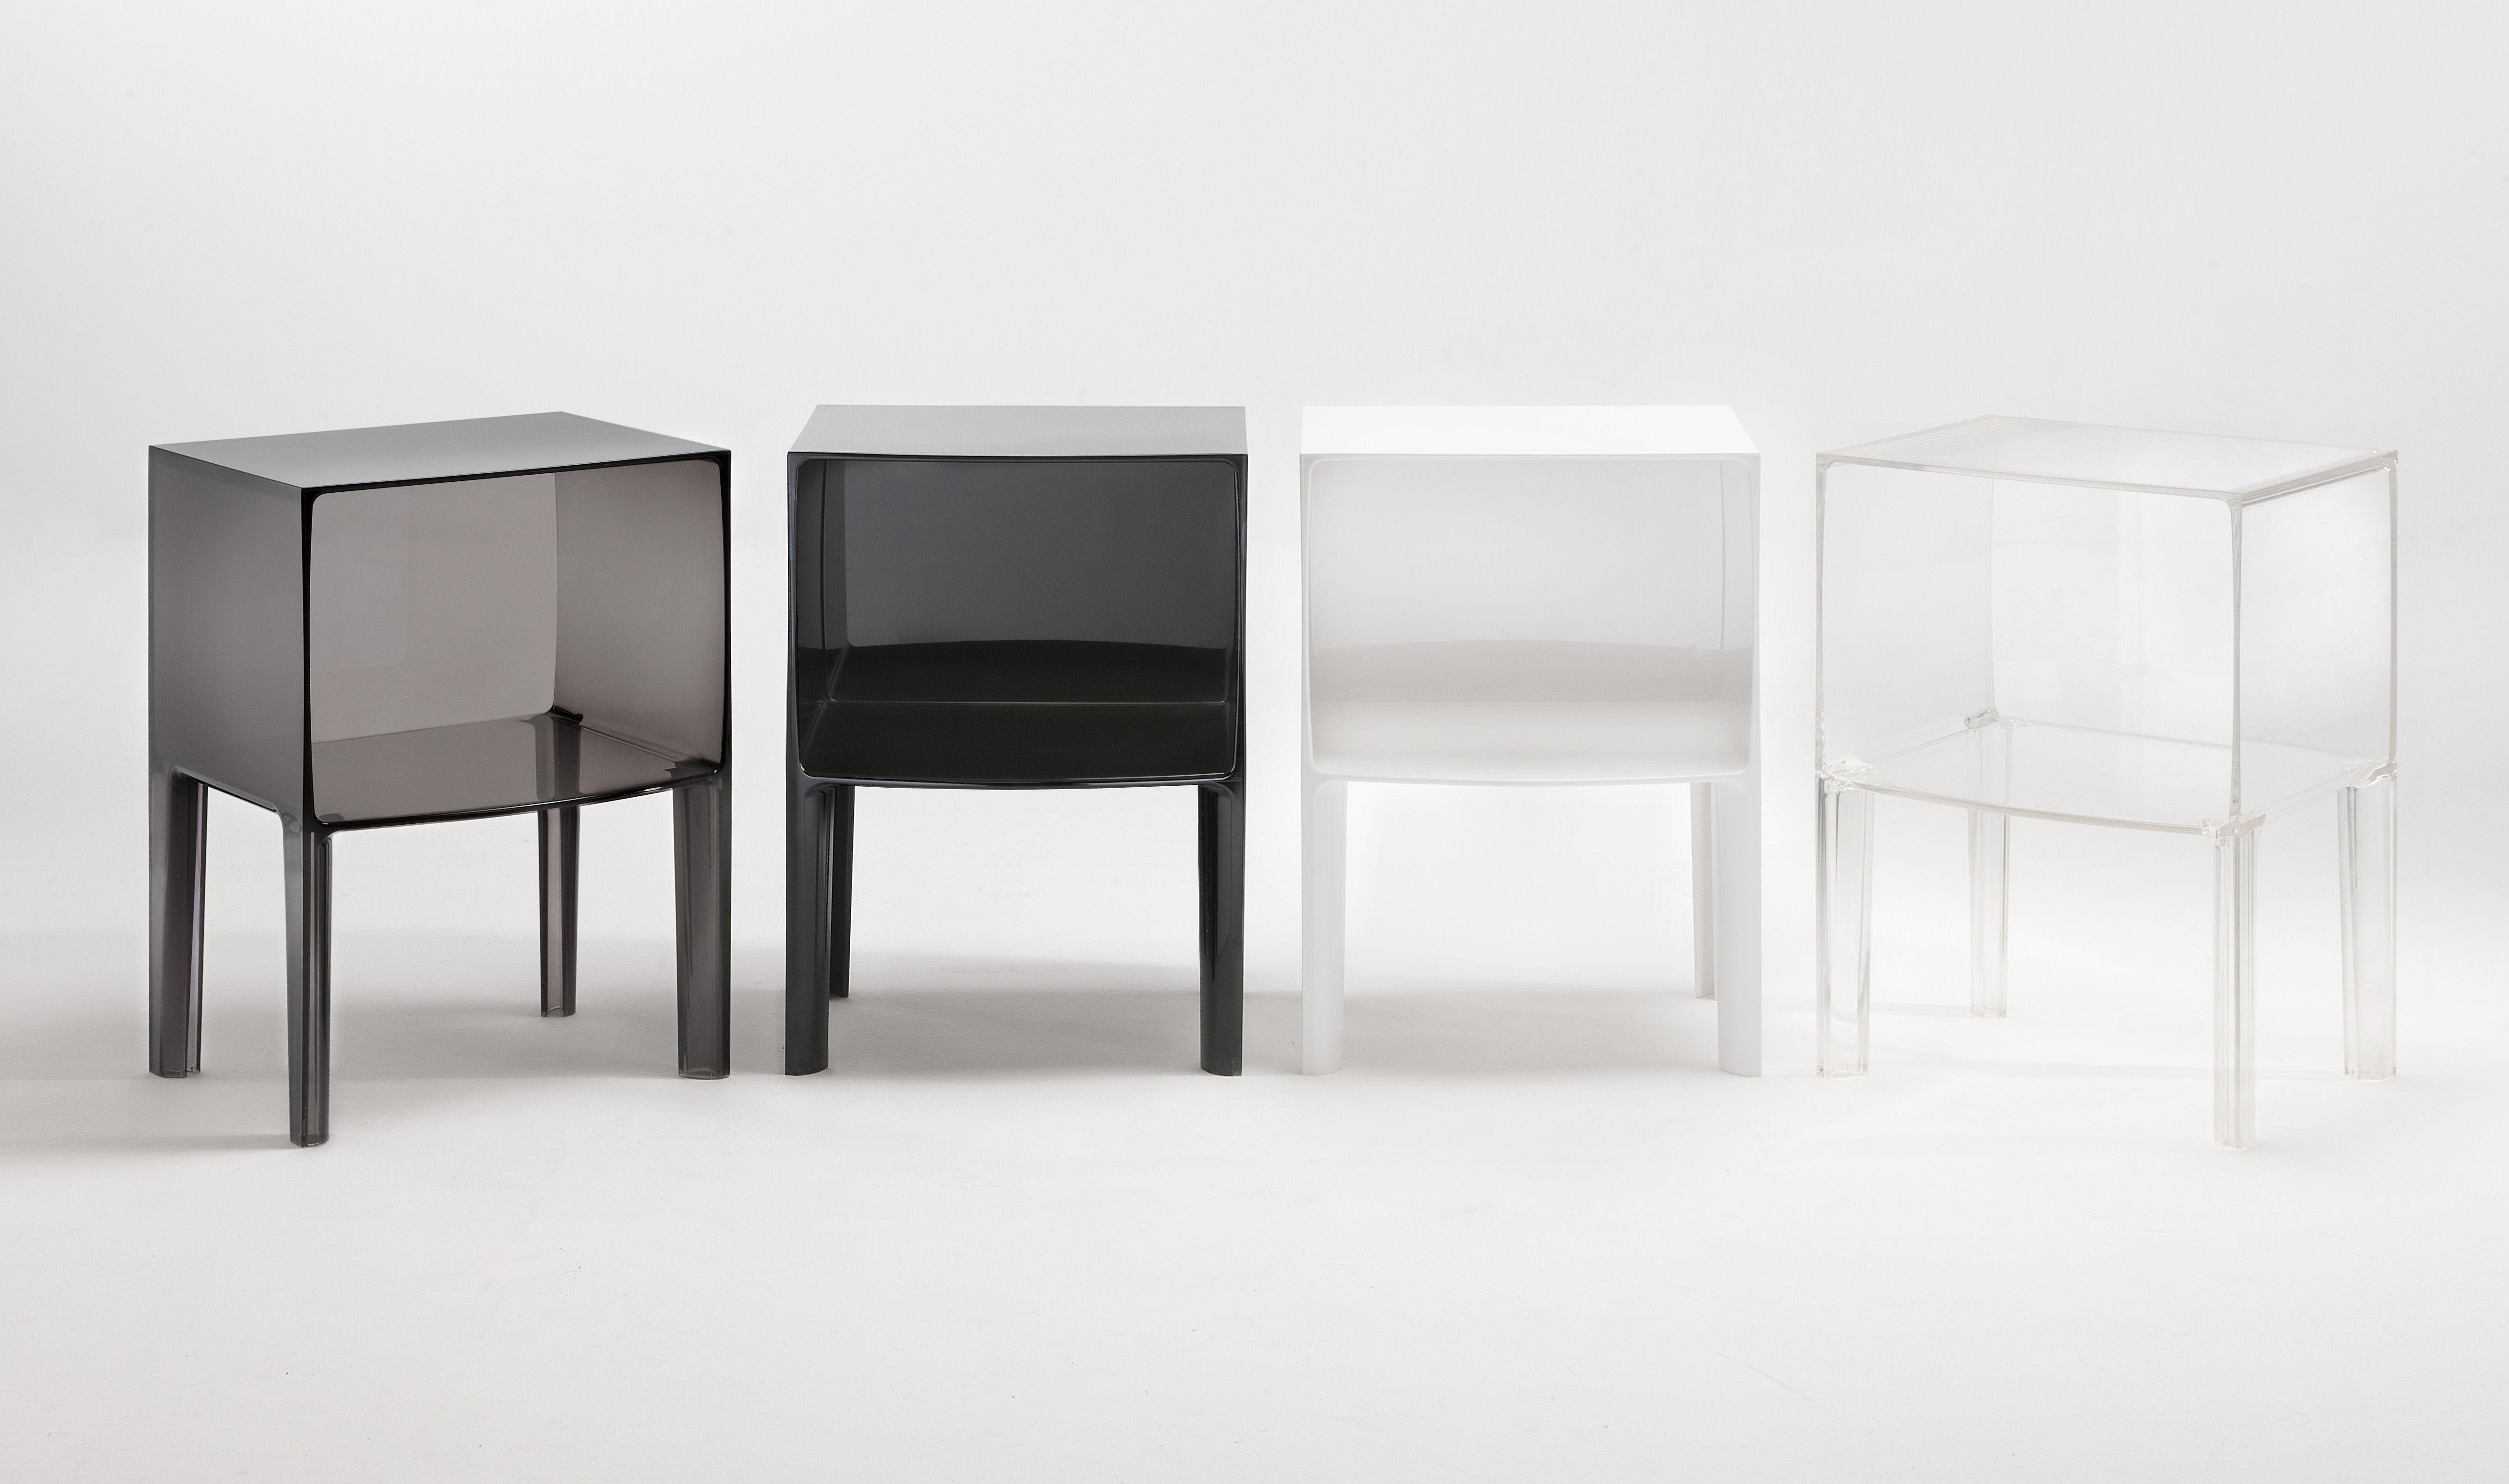 Table De Chevet Componibili table de chevet small ghost buster - kartell